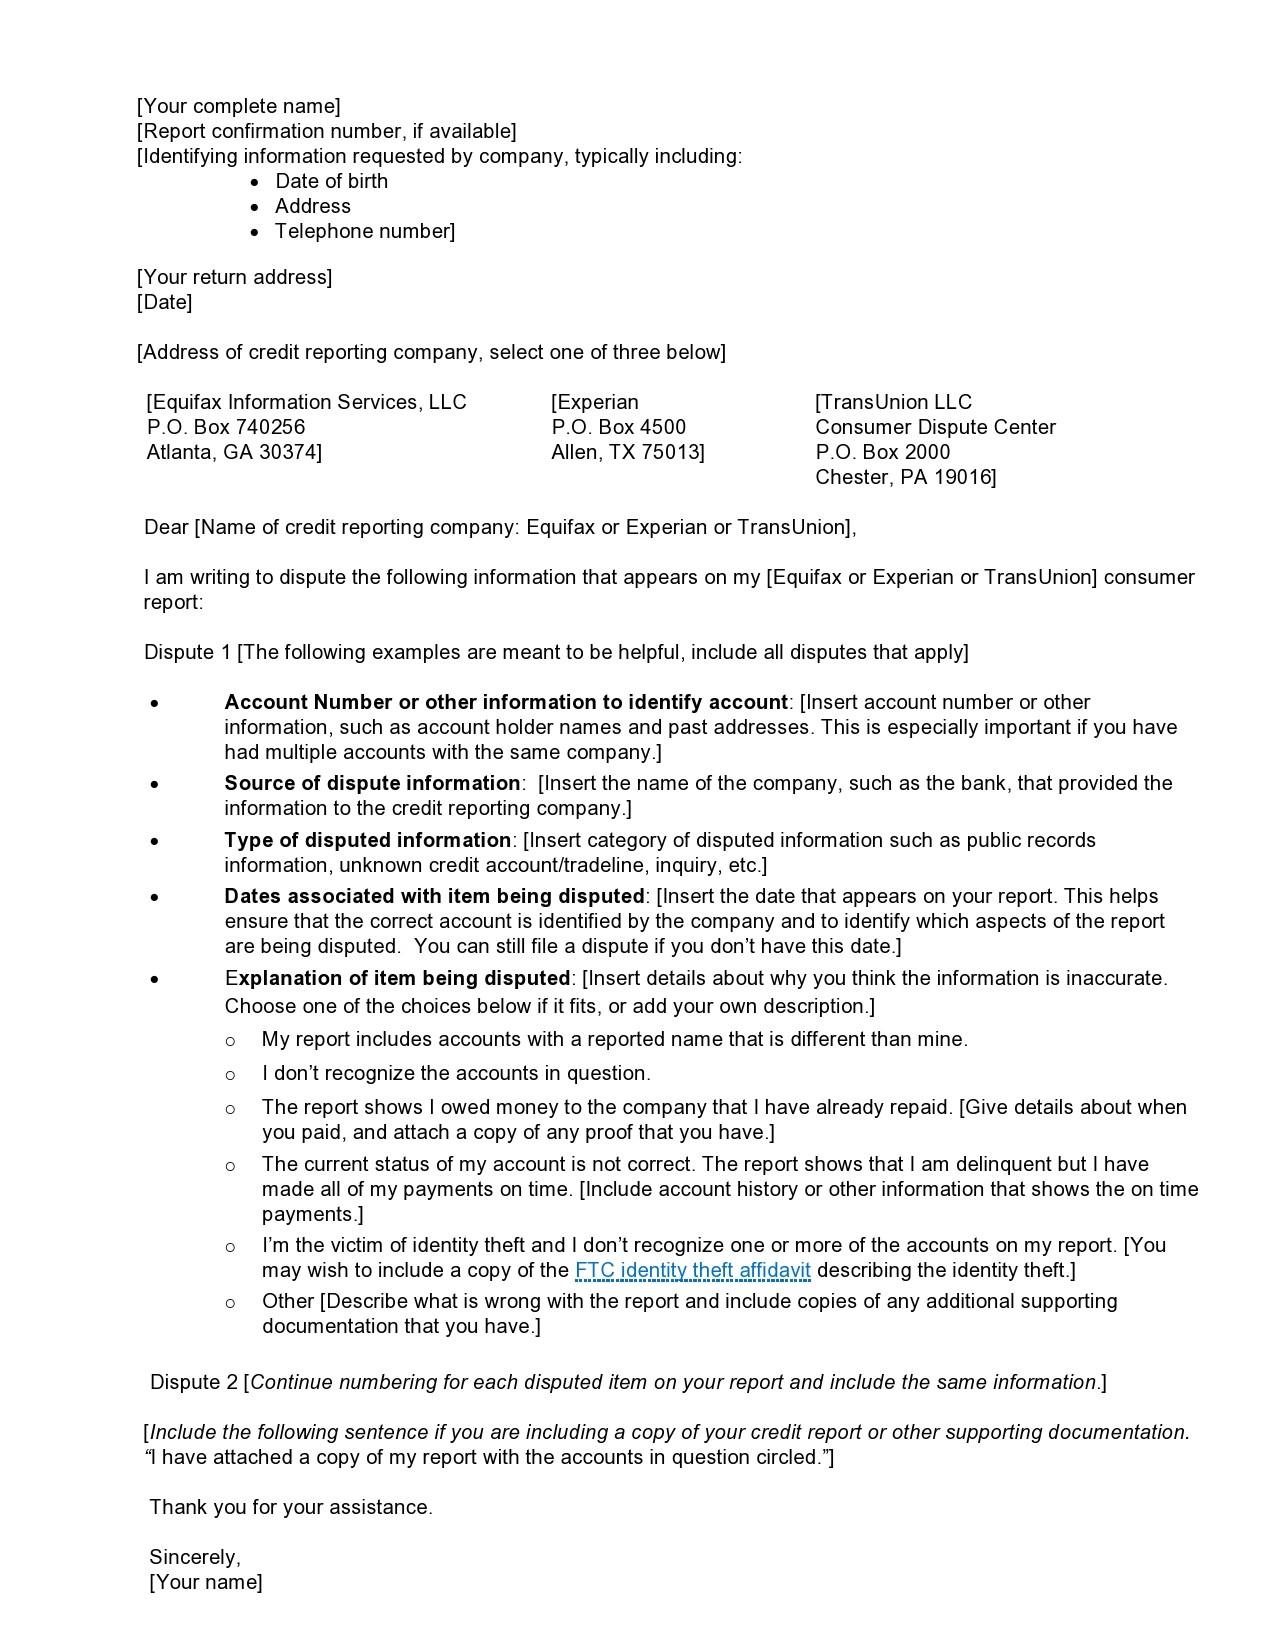 Free credit dispute letter 29